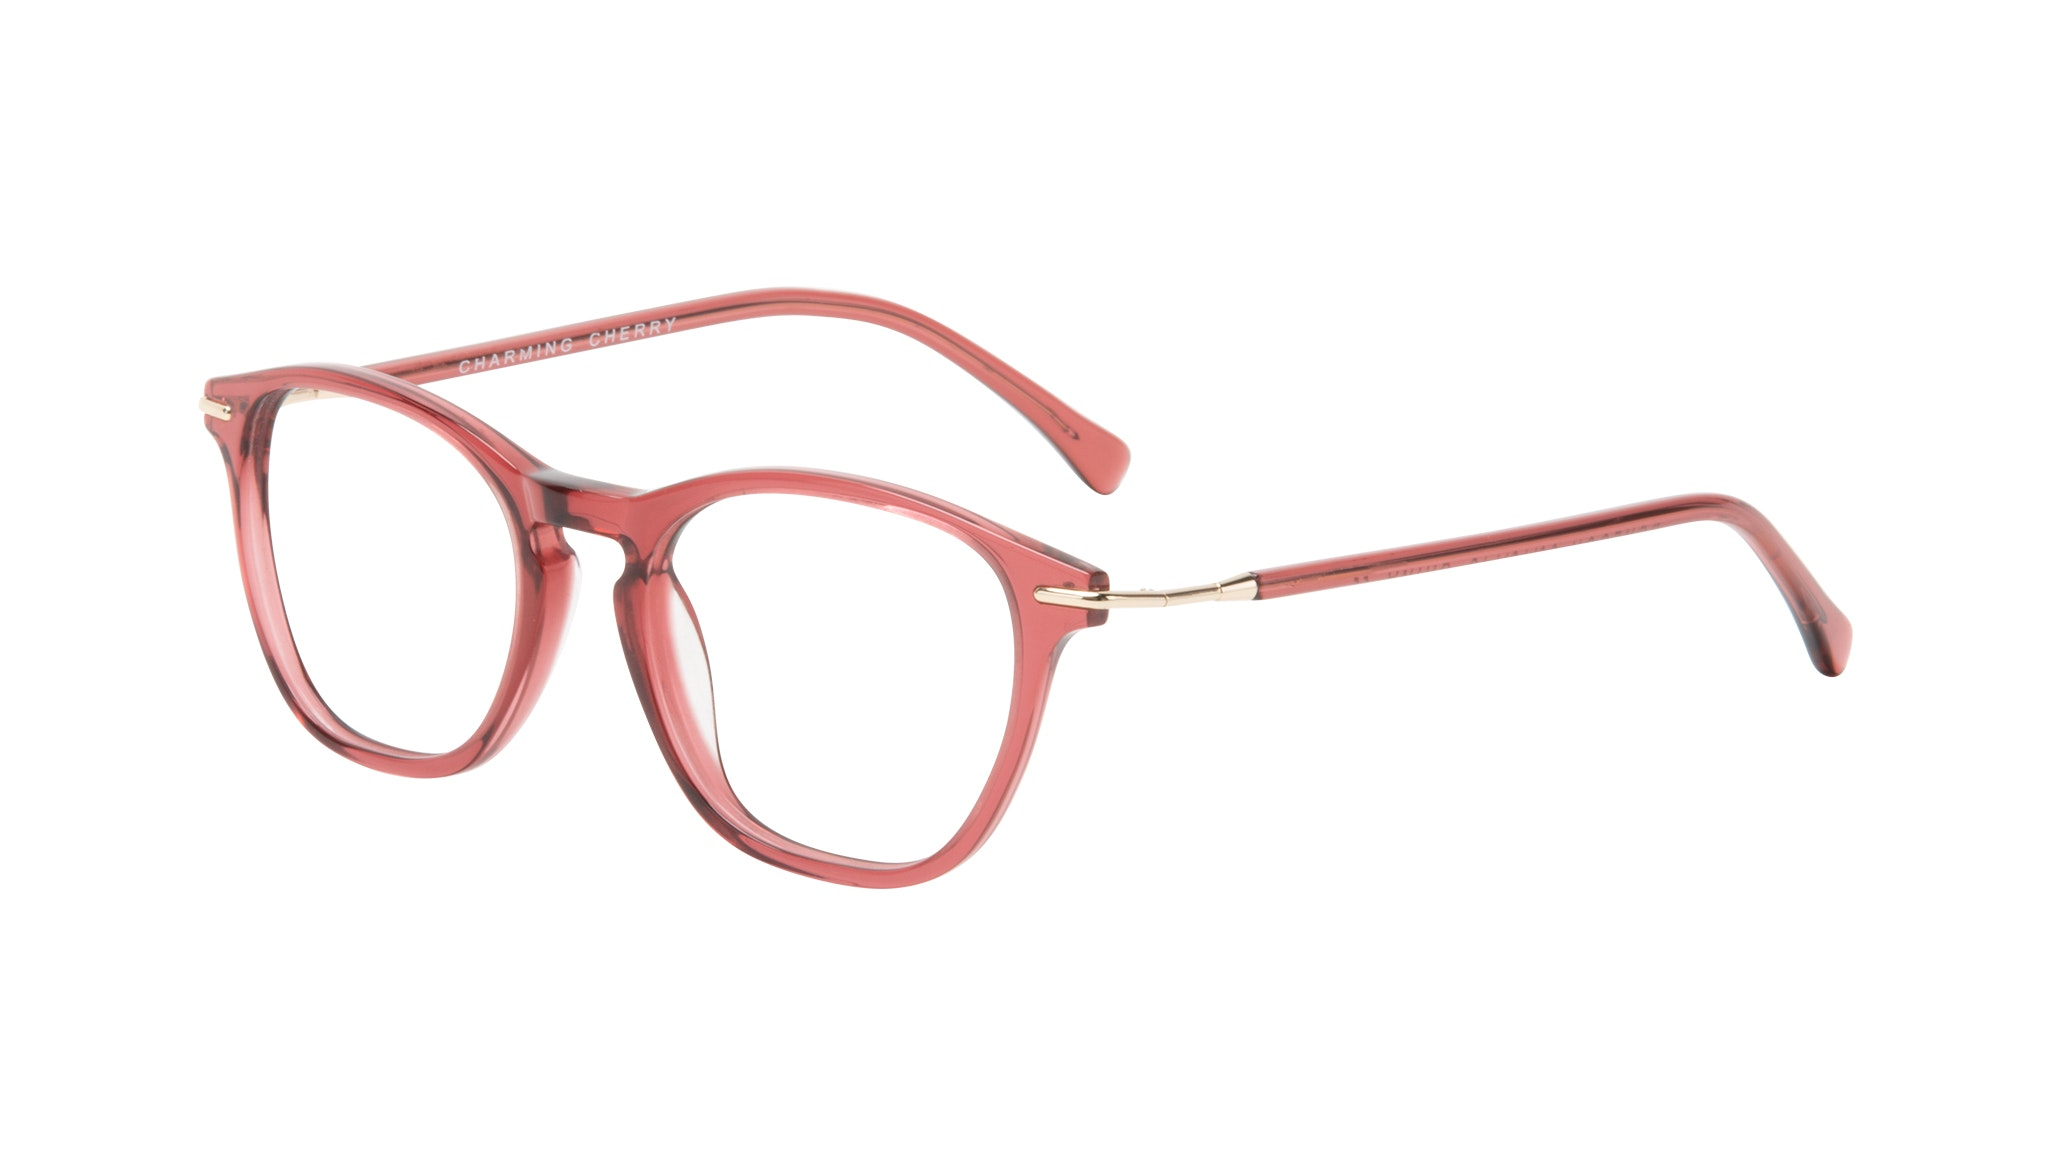 Affordable Fashion Glasses Square Eyeglasses Women Charming Cherry Tilt